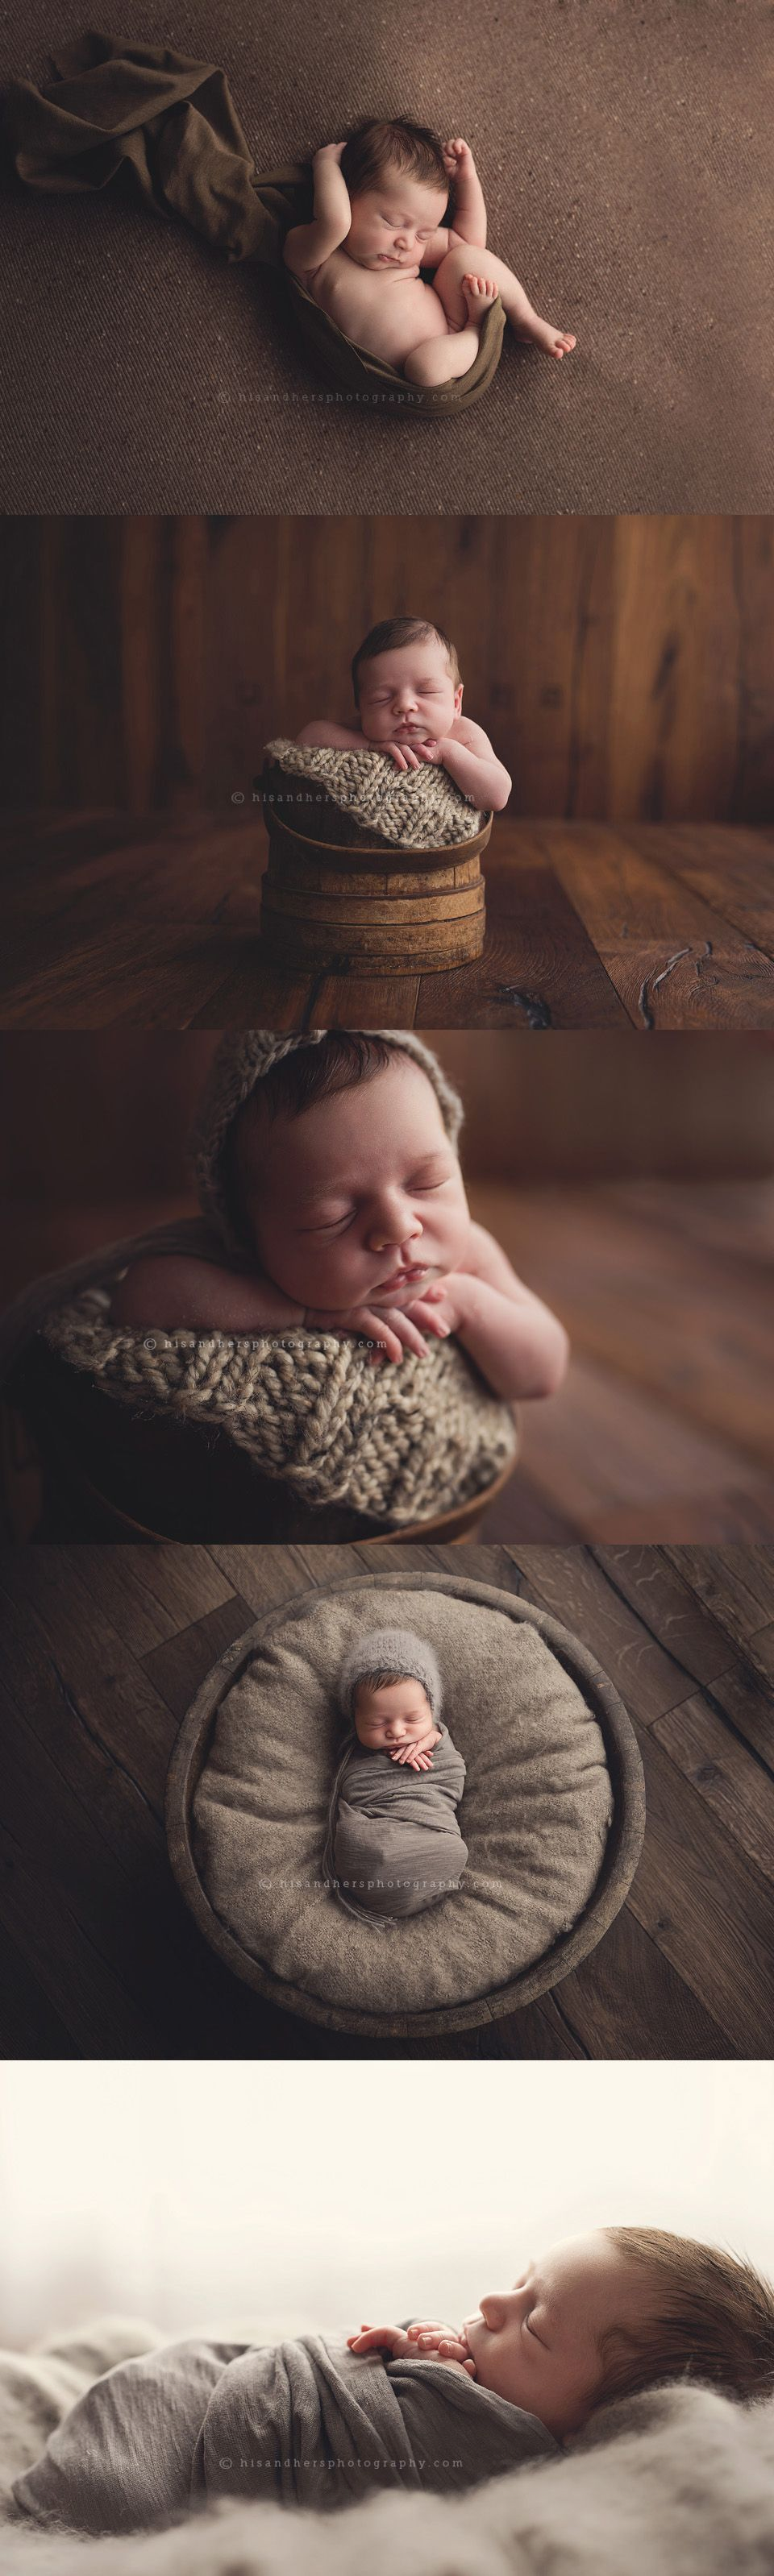 Newborn   Coen, 14 days new